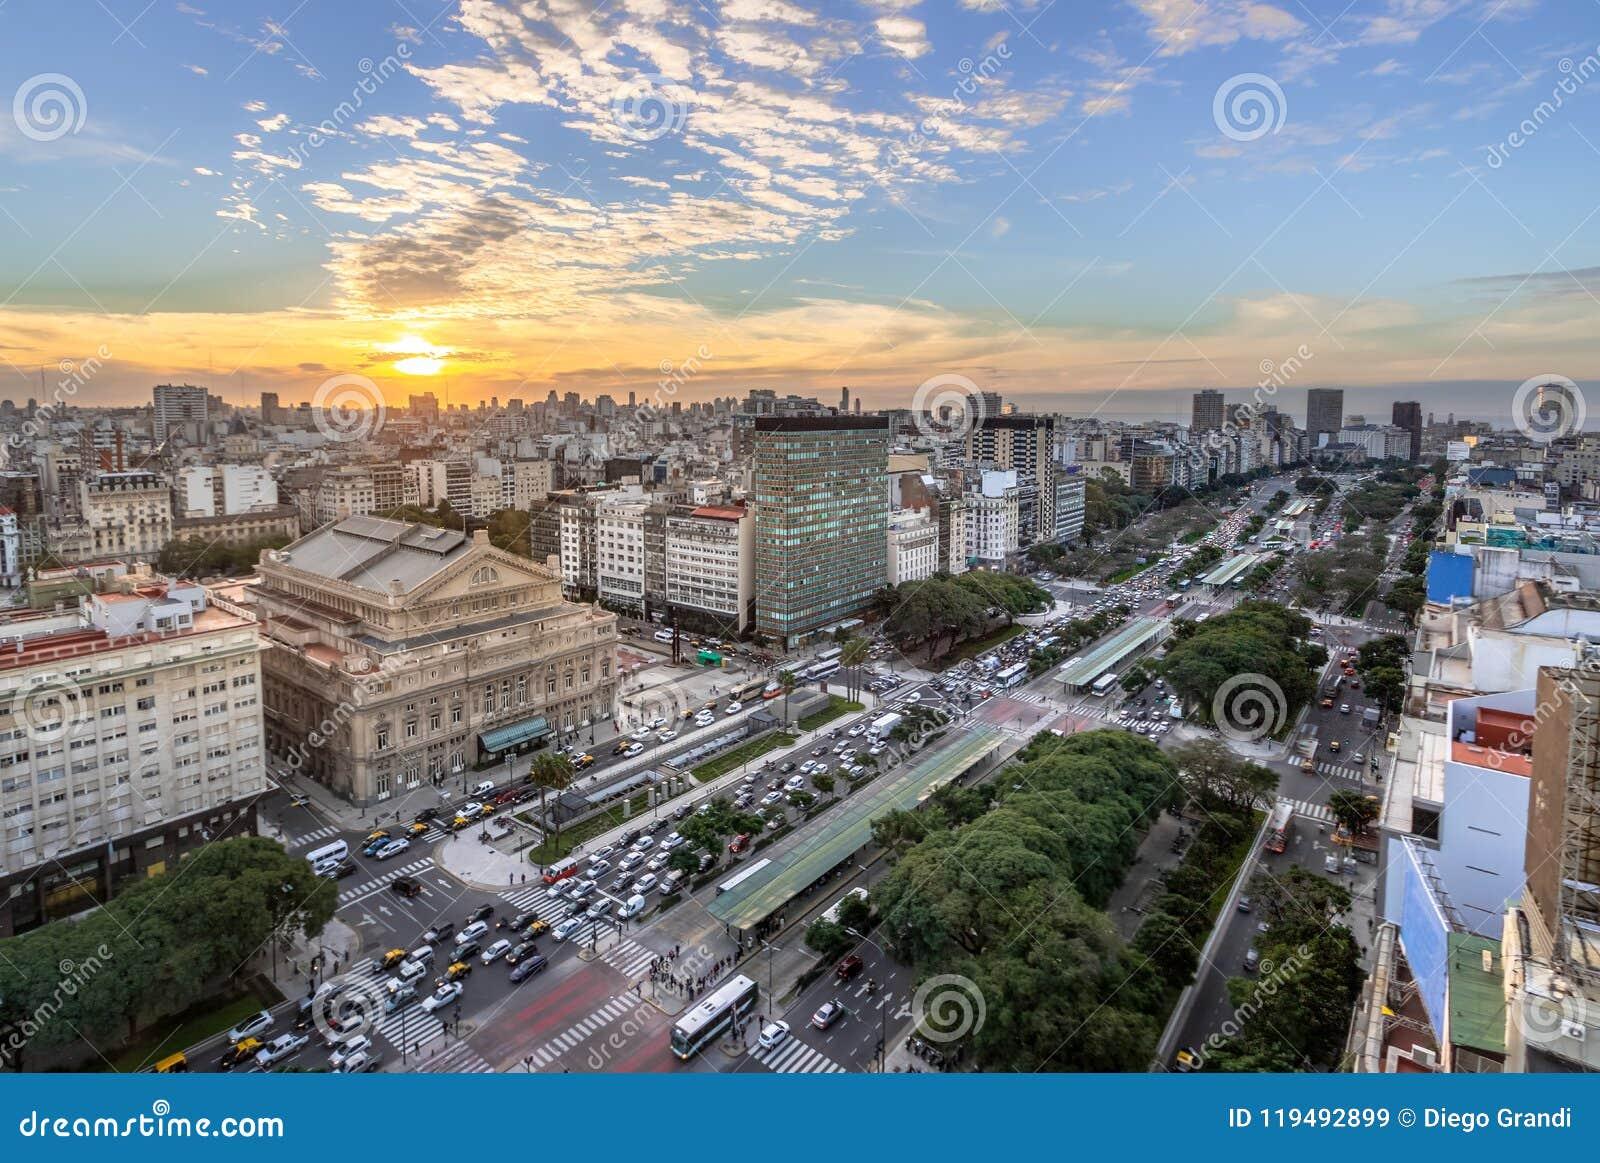 Aerial view of 9 de Julio Avenue at sunset - Buenos Aires, Argentina